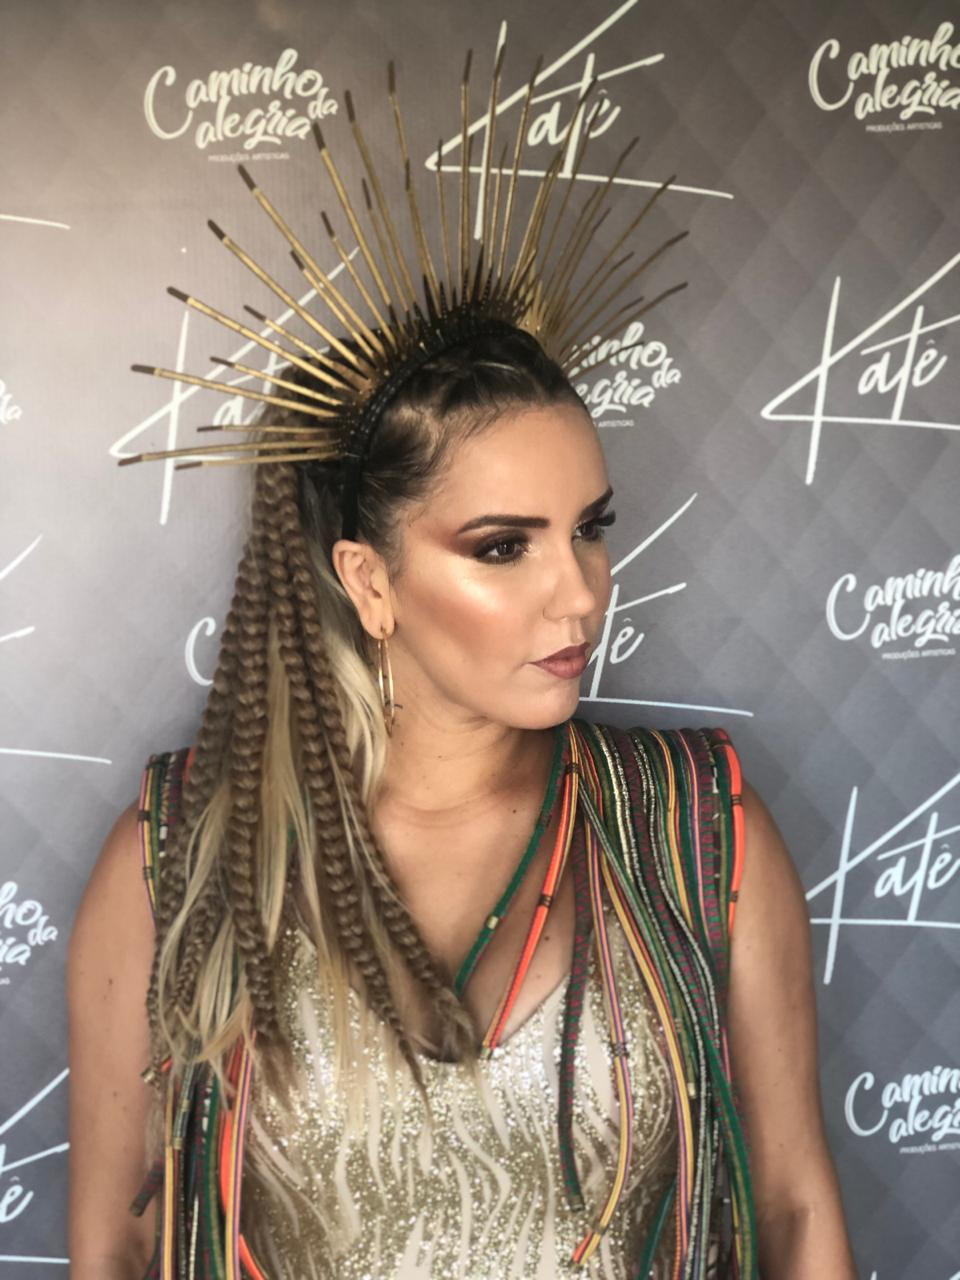 Katê de Deusa da terra para o carnaval de Salvador 2019